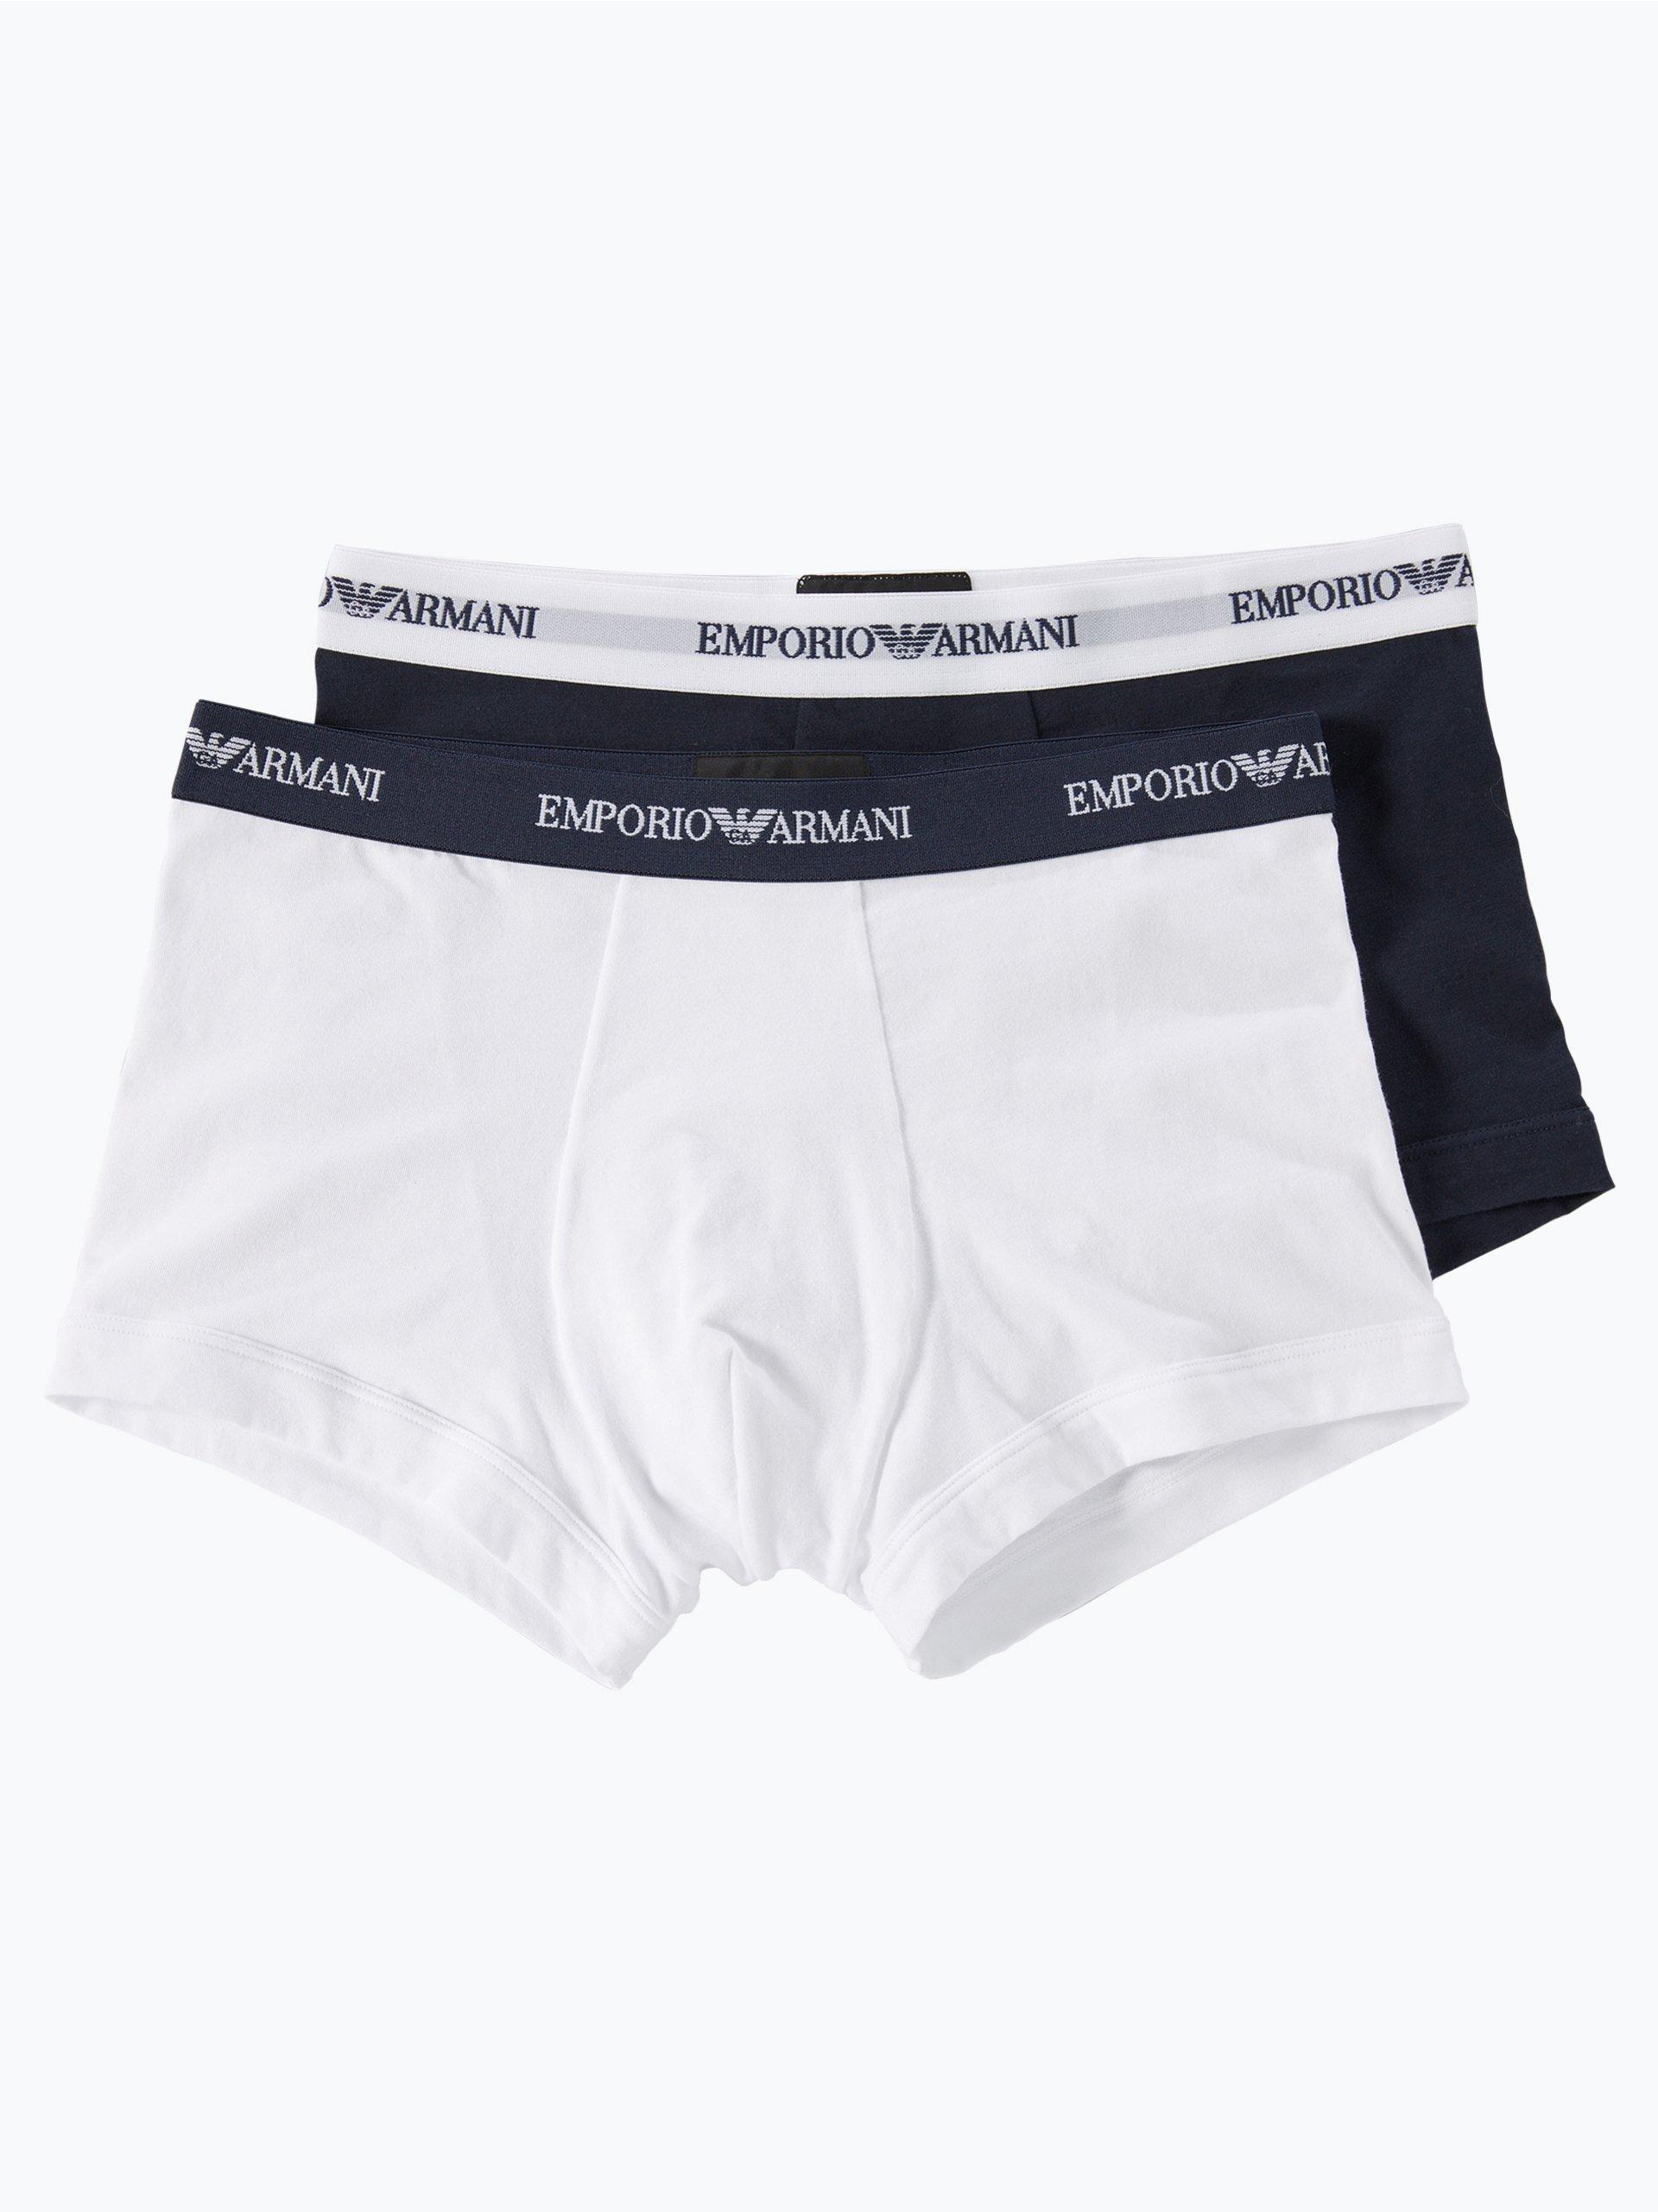 Emporio Armani Herren Pants im 2er-Pack